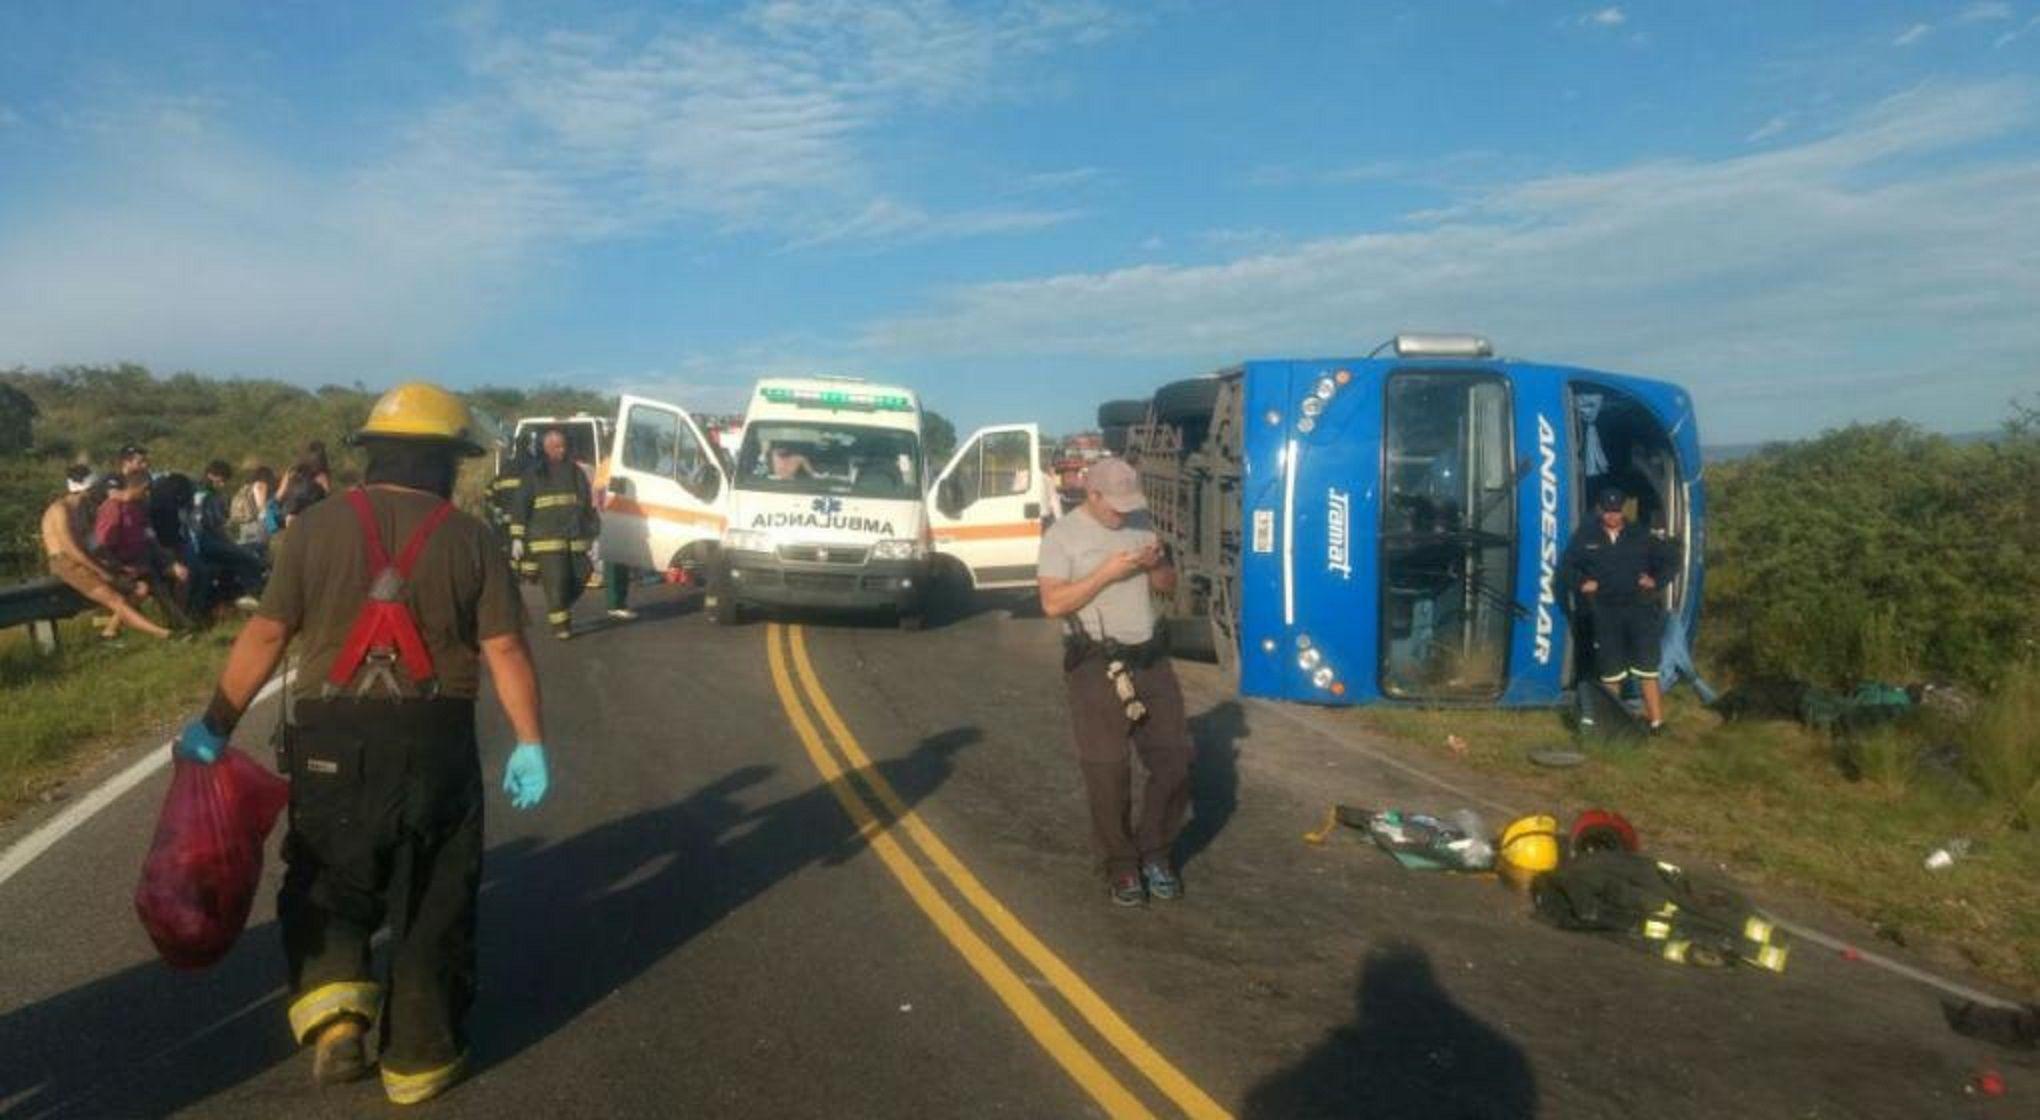 Volcó un colectivo que iba de Mendoza a Córdoba: hay 4 heridos graves